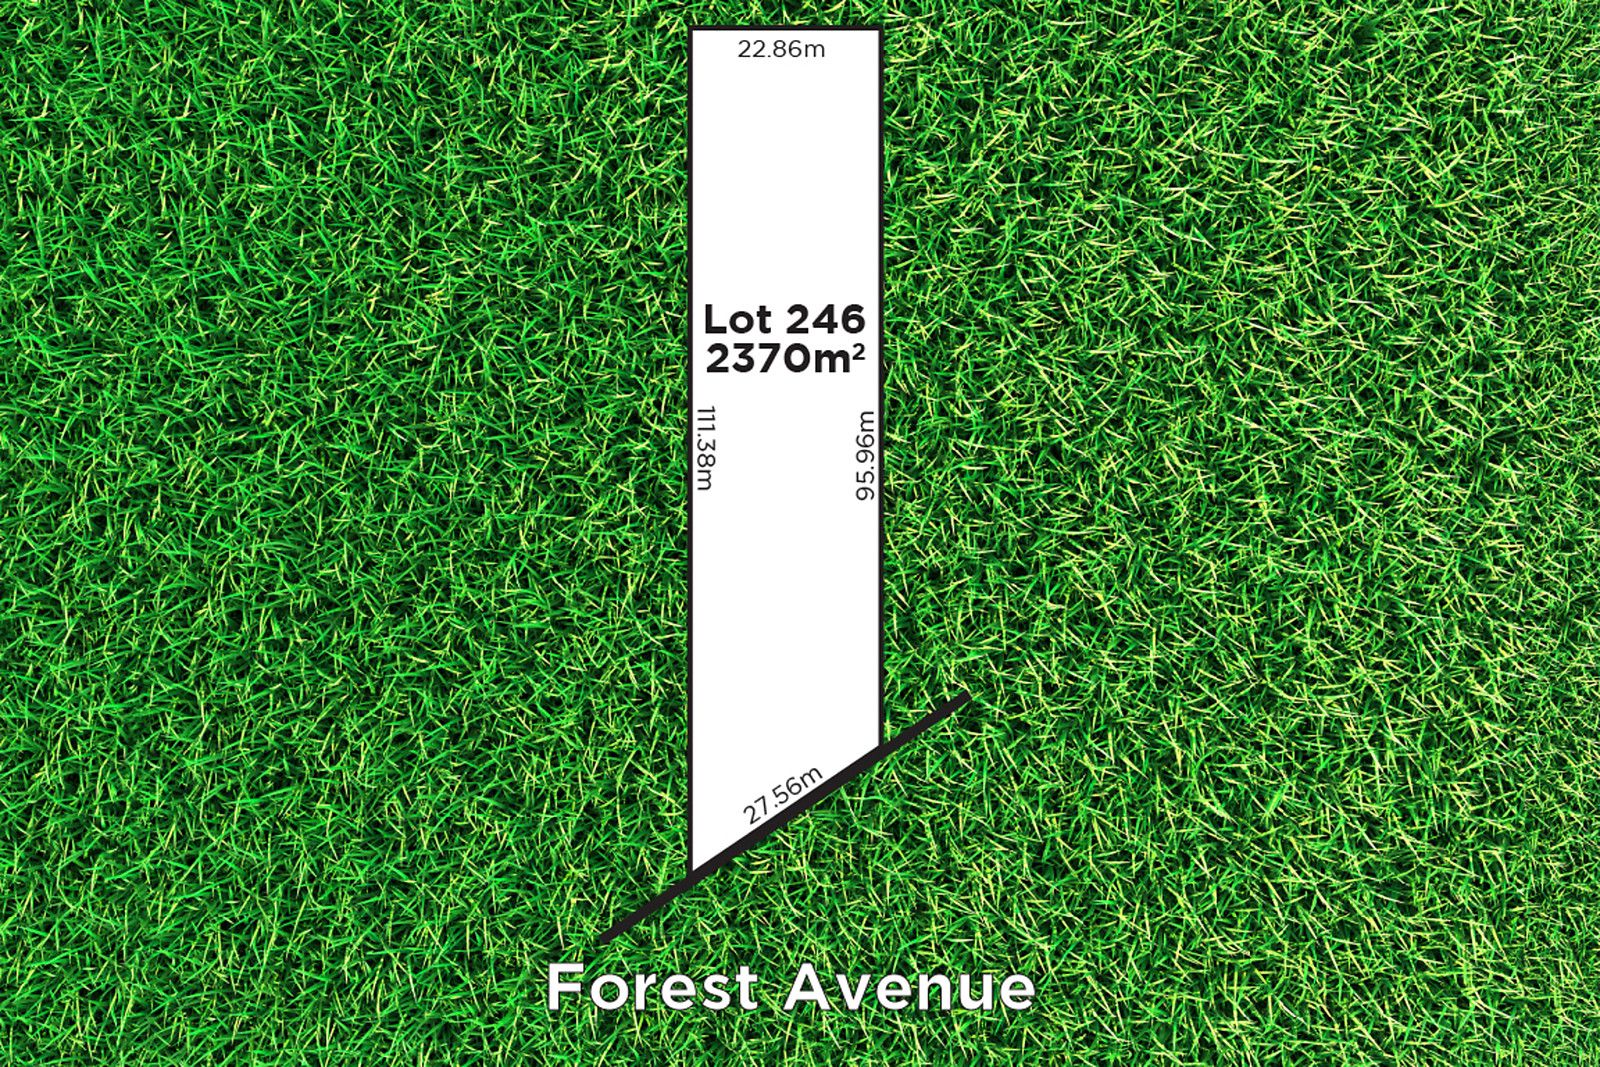 20 Forest Avenue, Hawthorndene SA 5051, Image 0